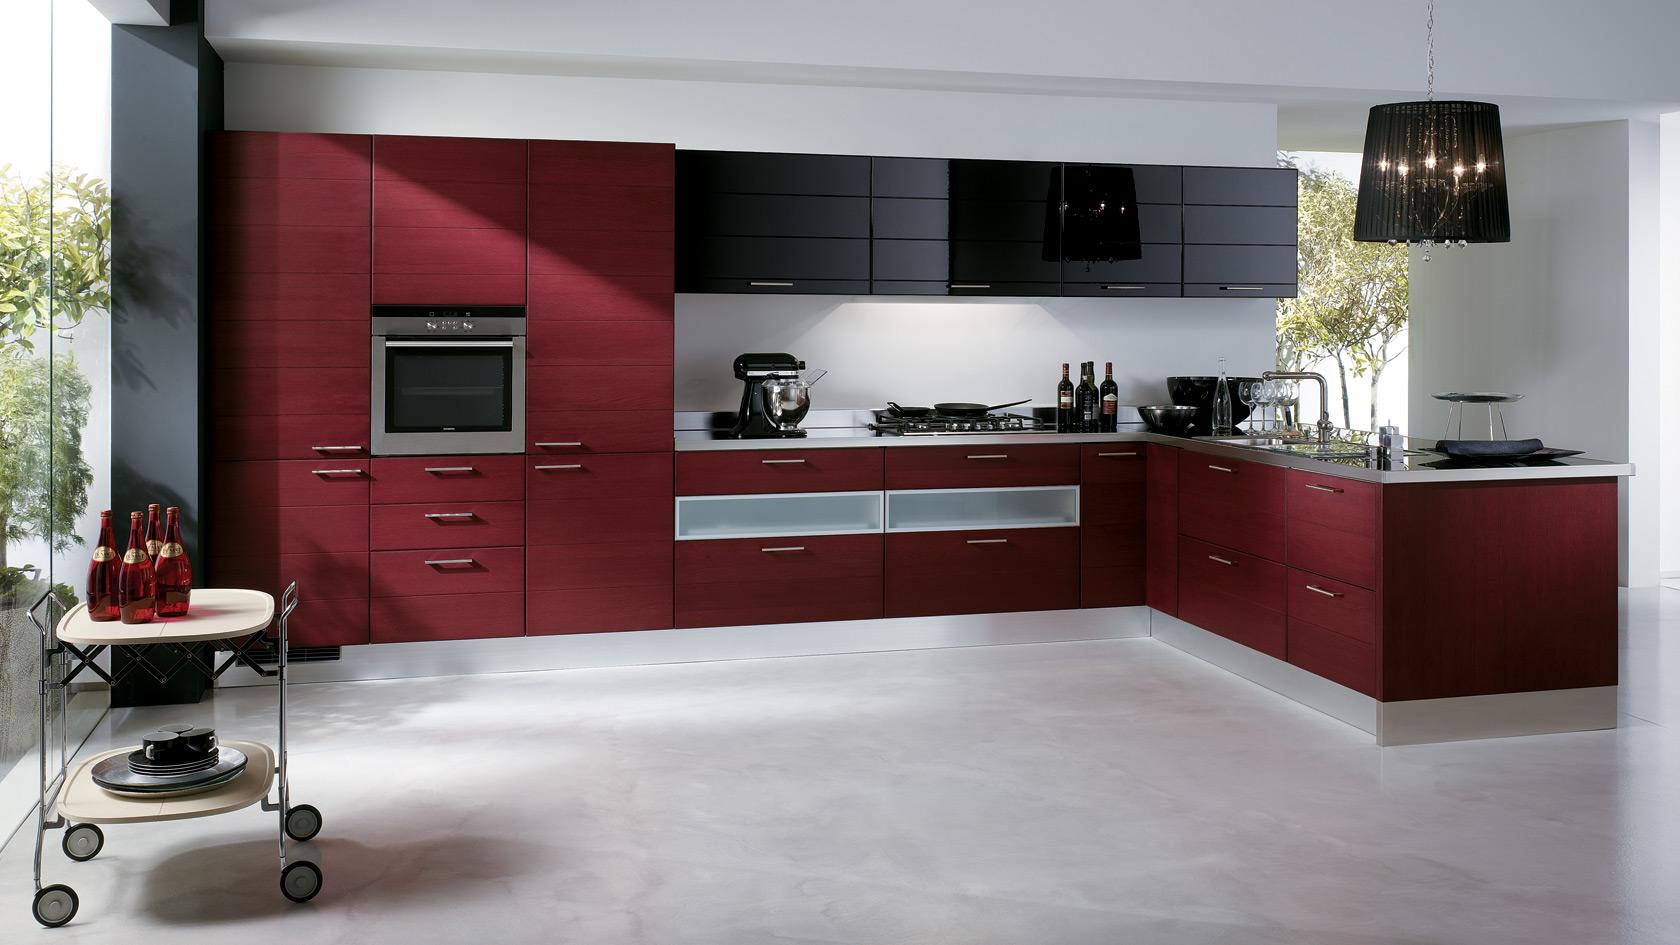 Emejing Cucine Moderne Scavolini 2014 Images - Design & Ideas 2018 ...